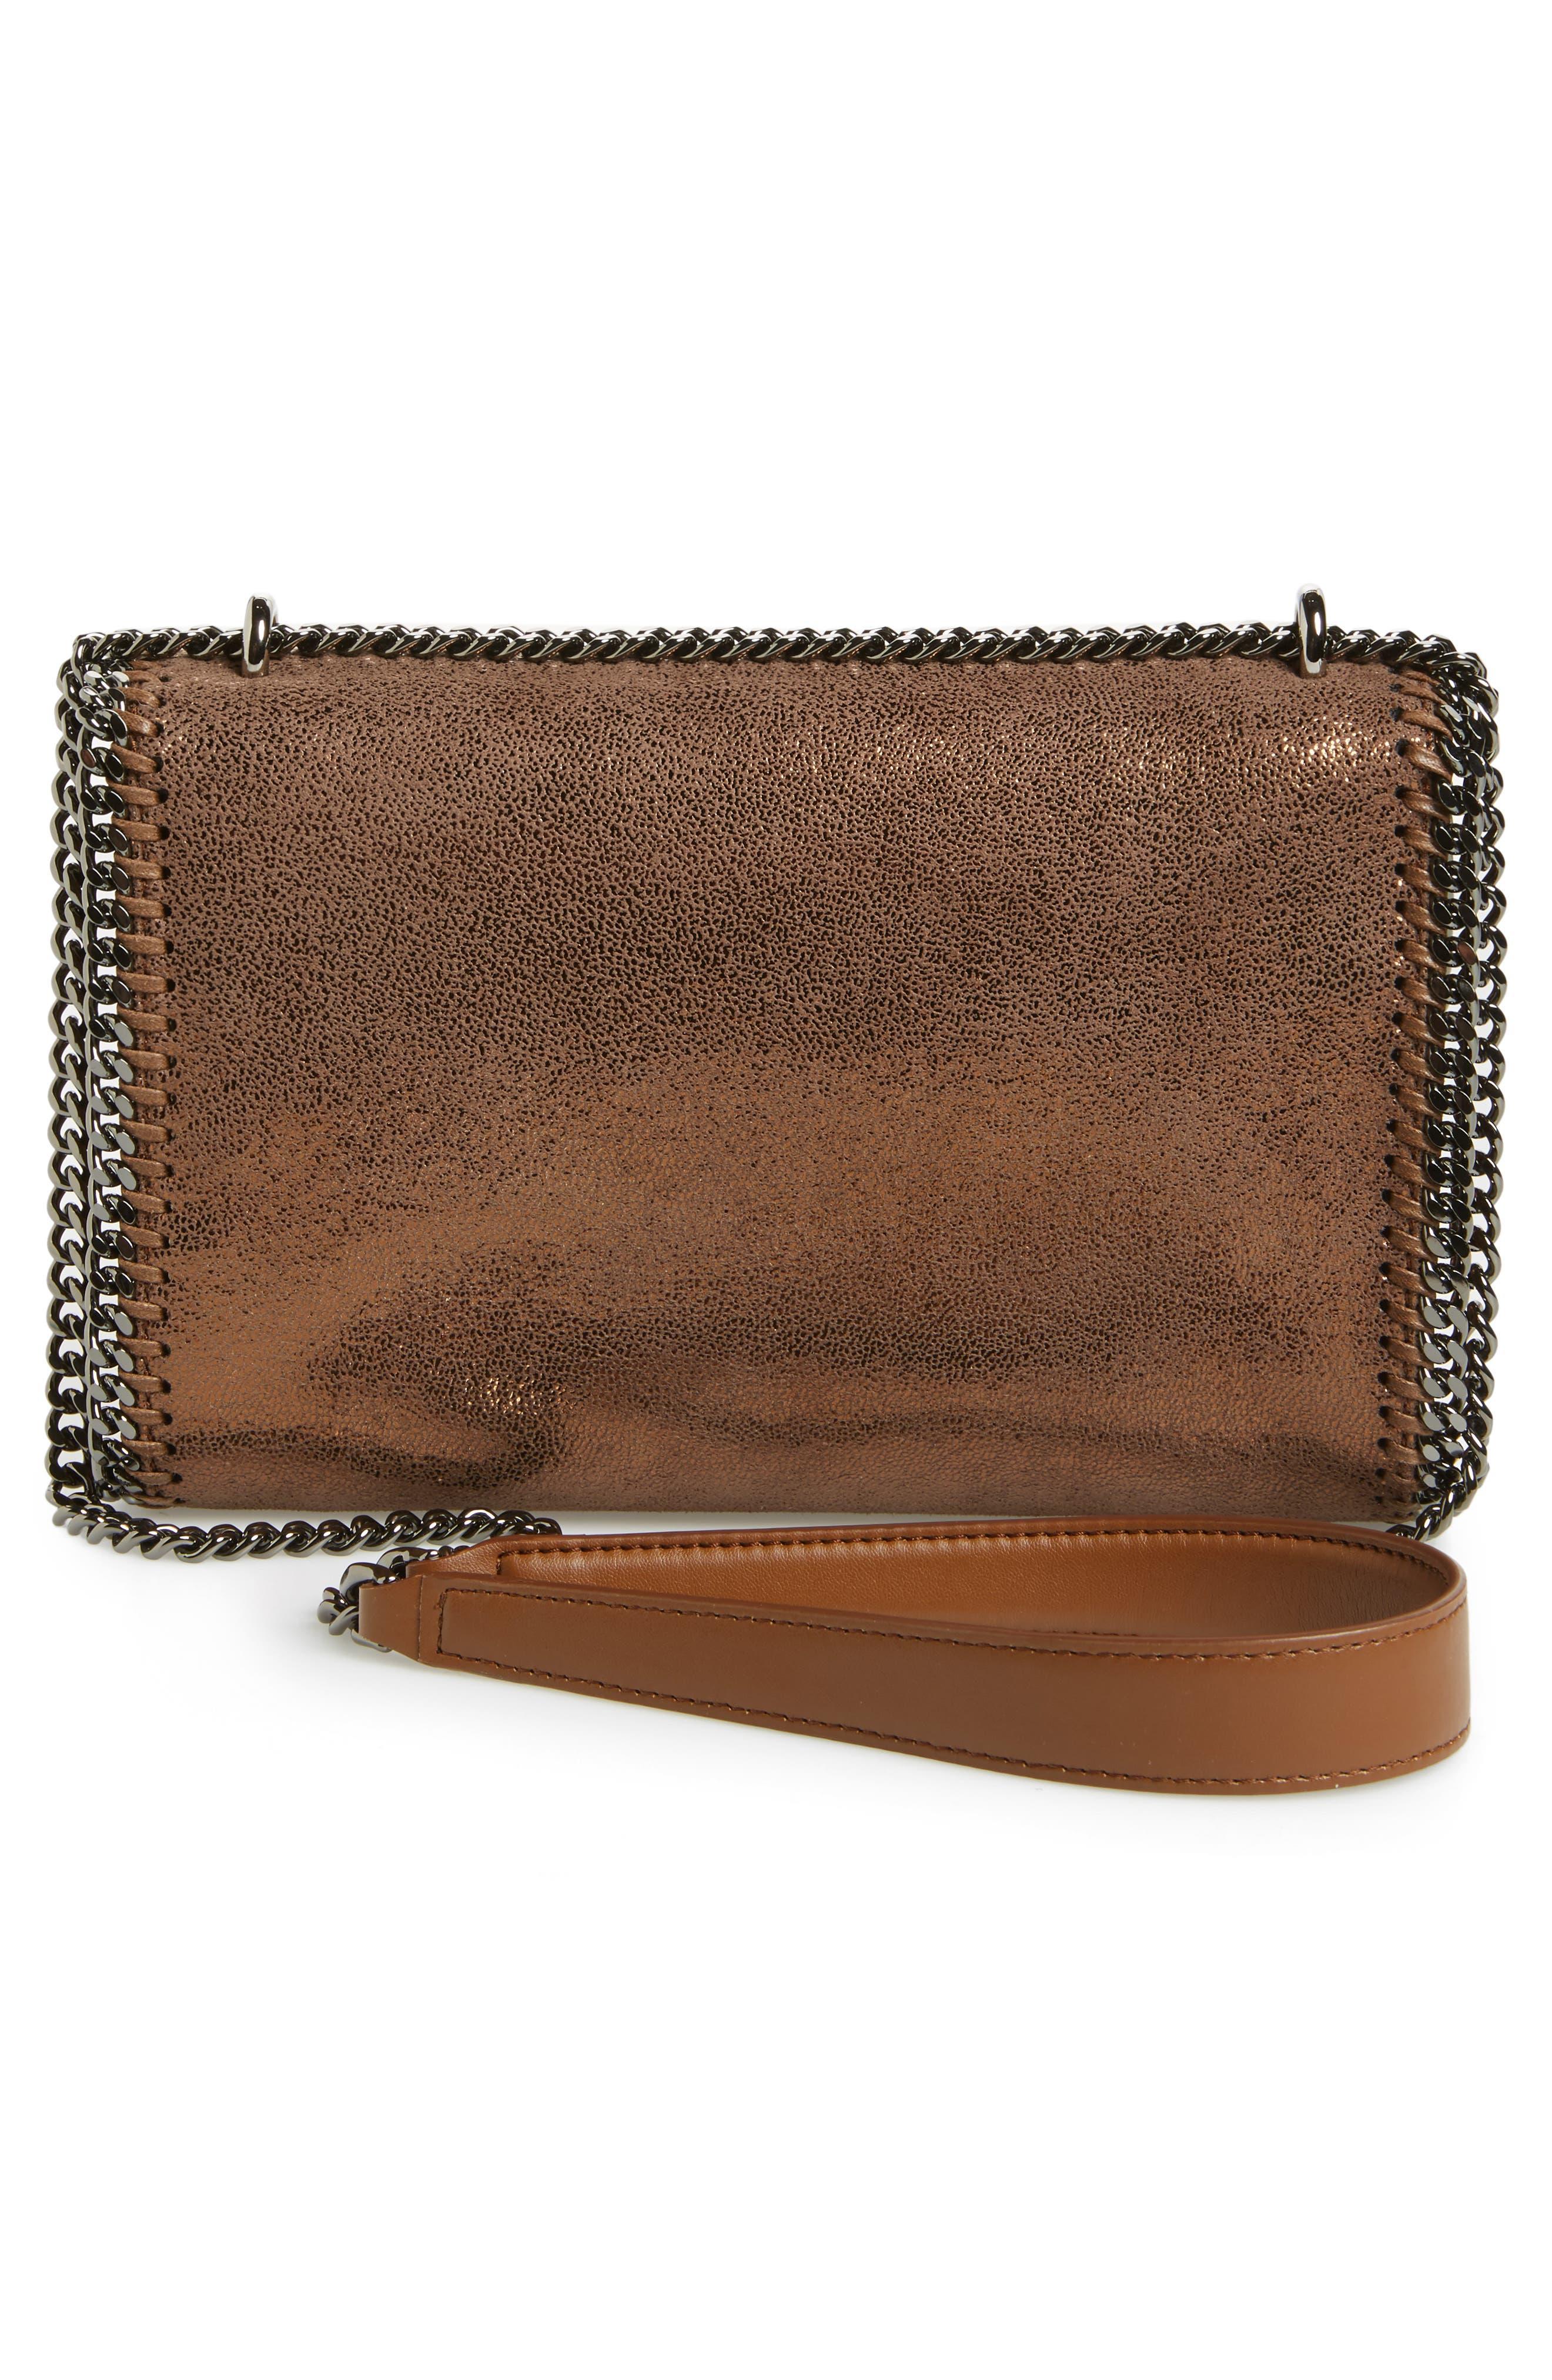 Falabella Metallic Faux Leather Convertible Shoulder Bag,                             Alternate thumbnail 3, color,                             200